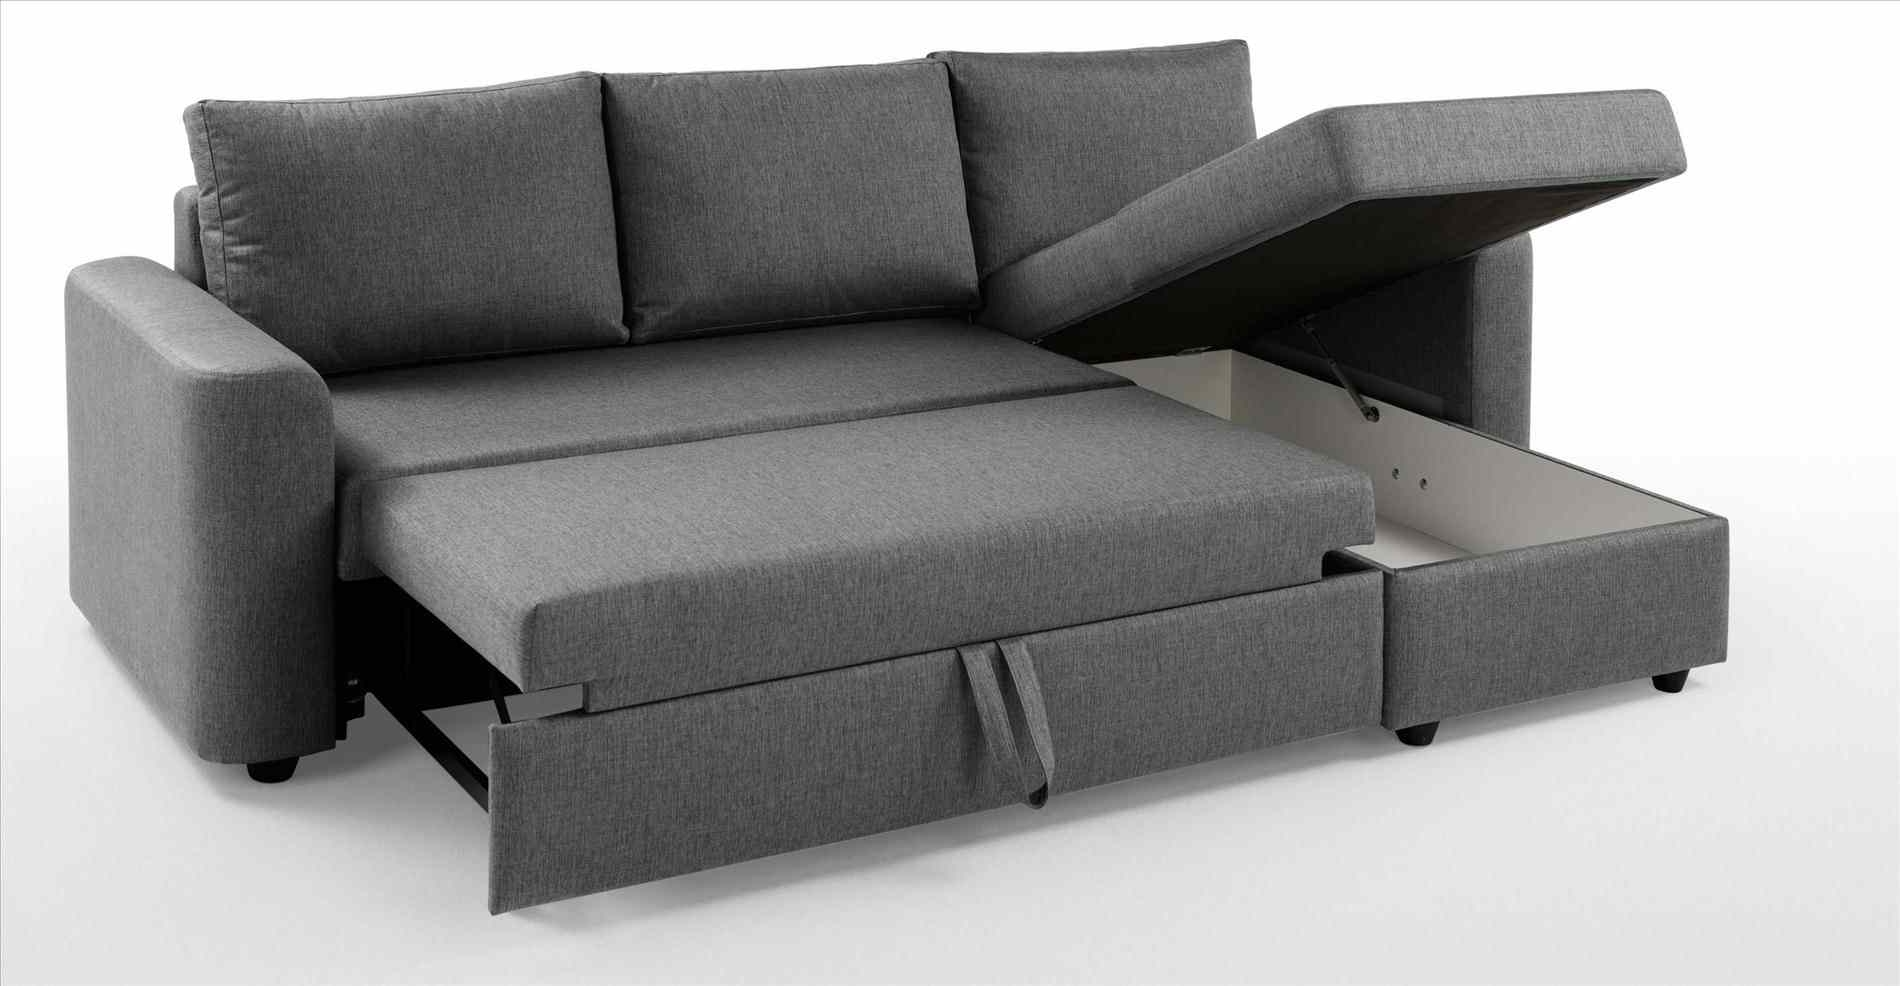 Sofa : Friheten Storage Sofa Bed Corner With Skiftebo Dark Gray Ikea In Sectional Sofas In Philippines (View 5 of 10)